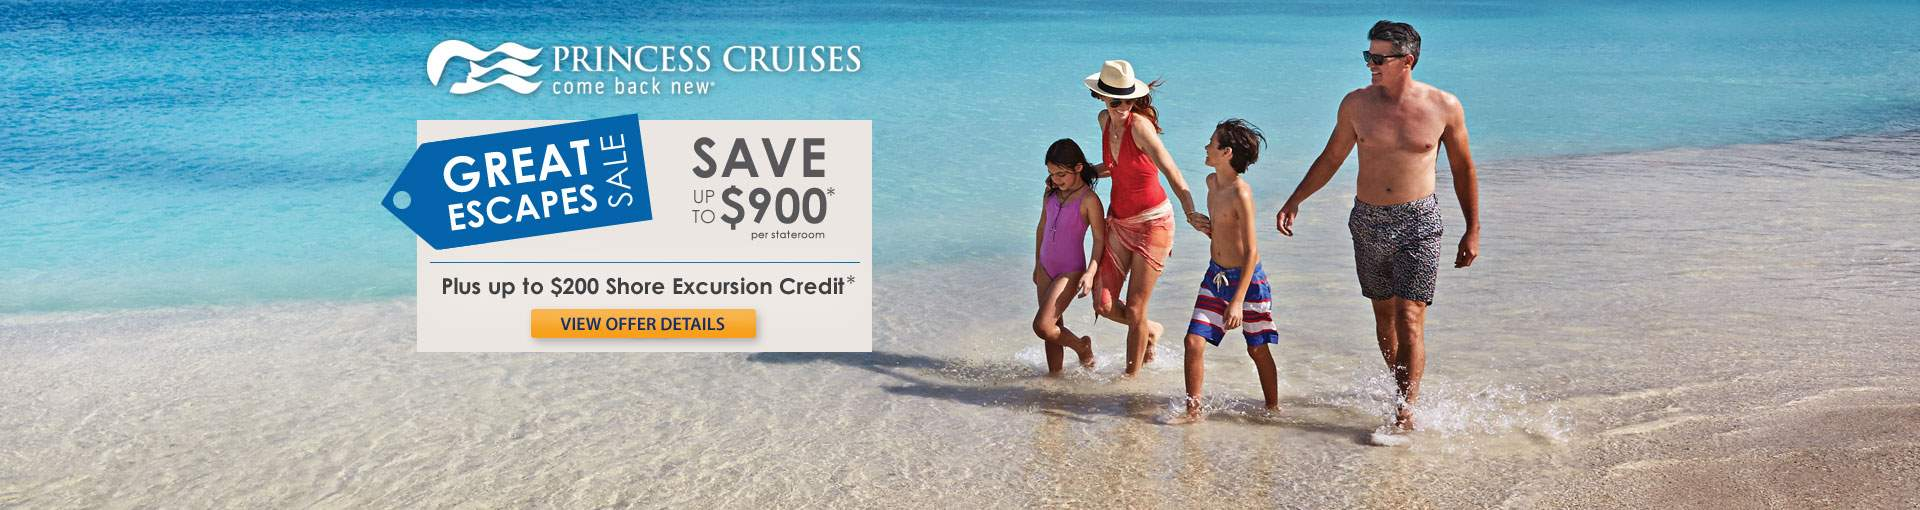 Princess Cruises Great Escapes Cruise Sale